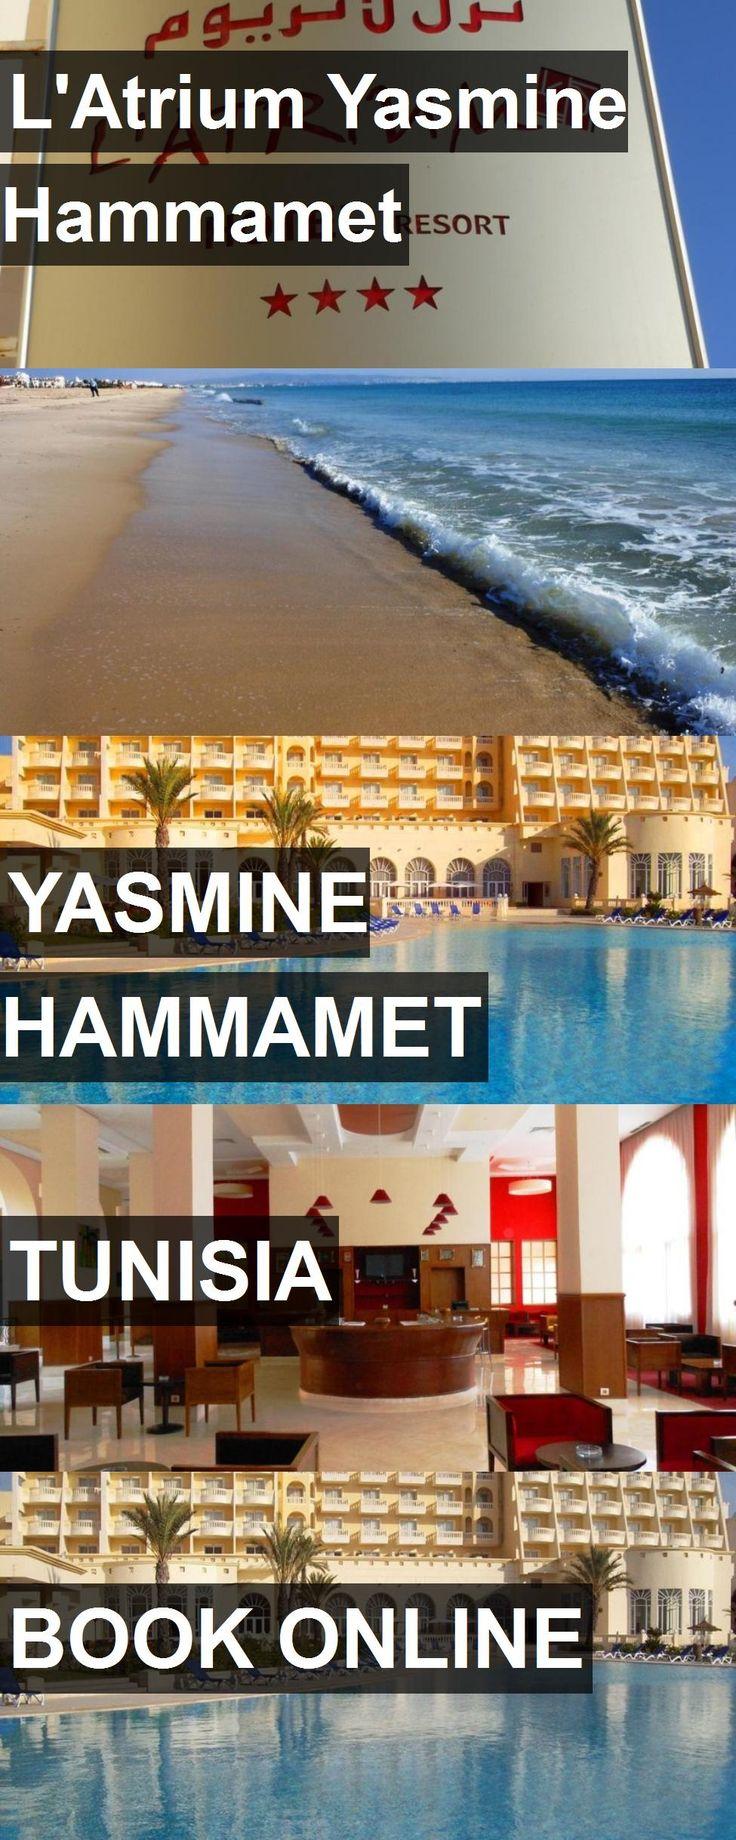 Hotel L'Atrium Yasmine Hammamet in Yasmine Hammamet, Tunisia. For more information, photos, reviews and best prices please follow the link. #Tunisia #YasmineHammamet #travel #vacation #hotel